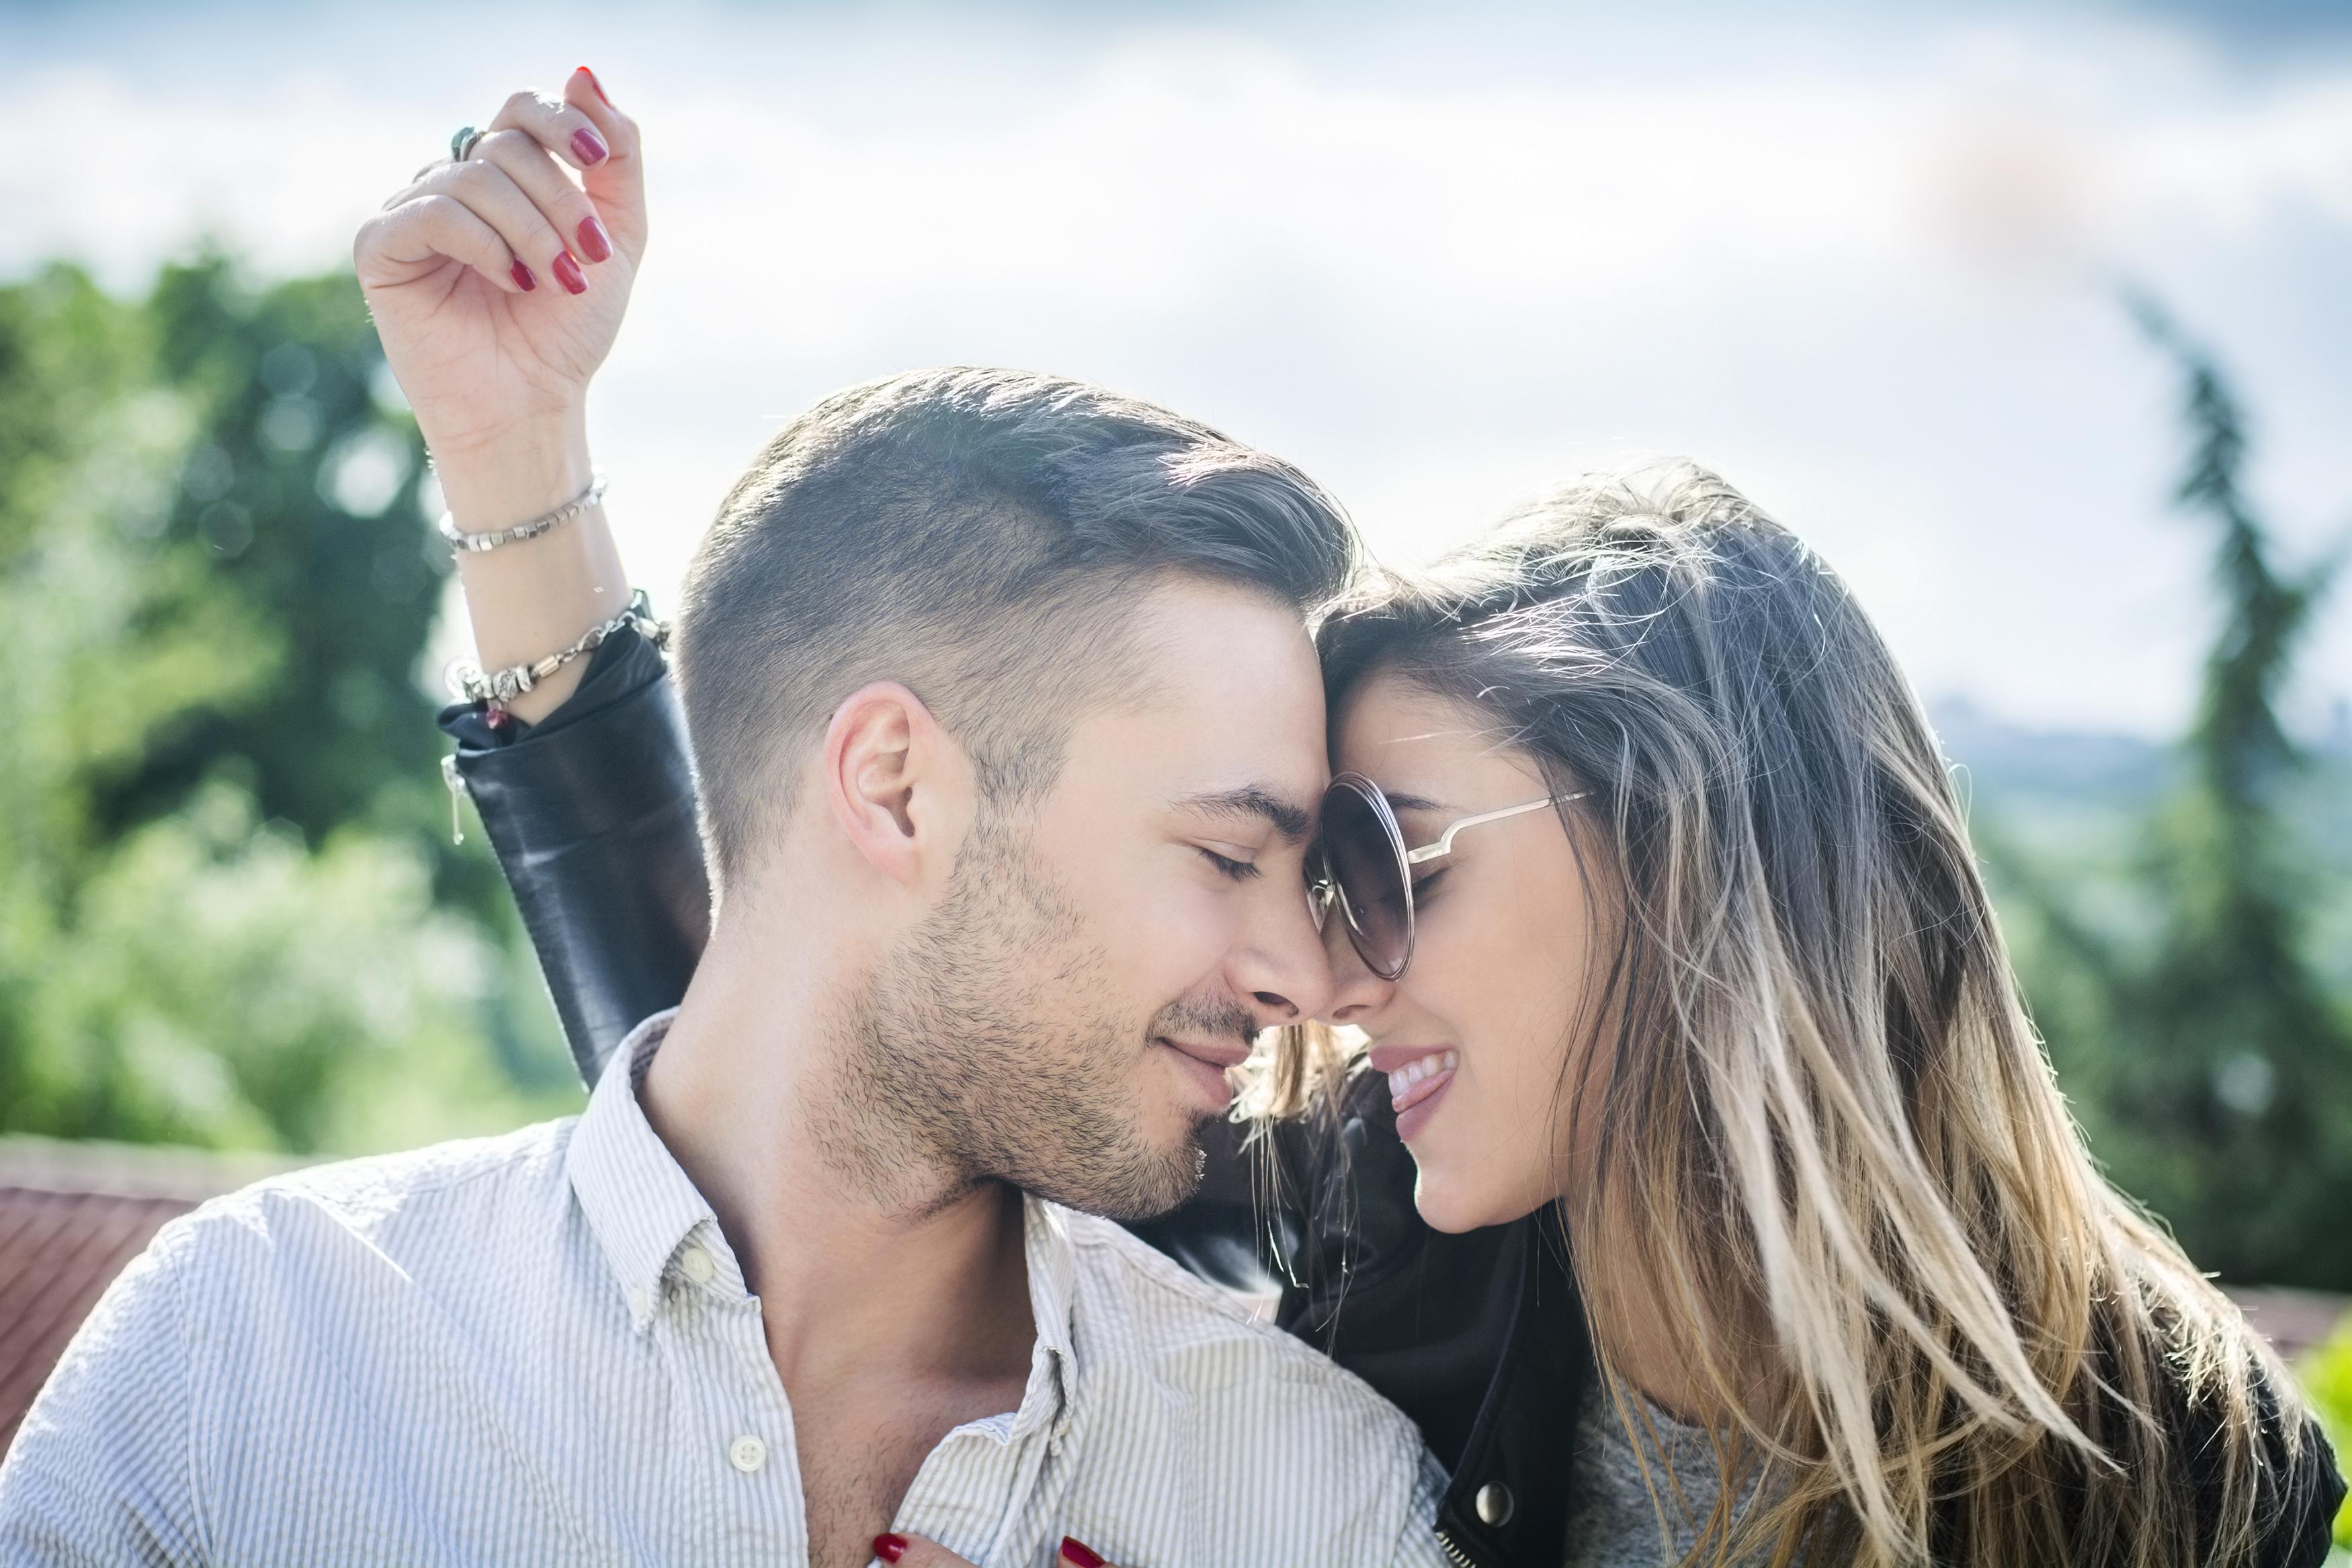 ANGELIQUE: Erotic couples having sex